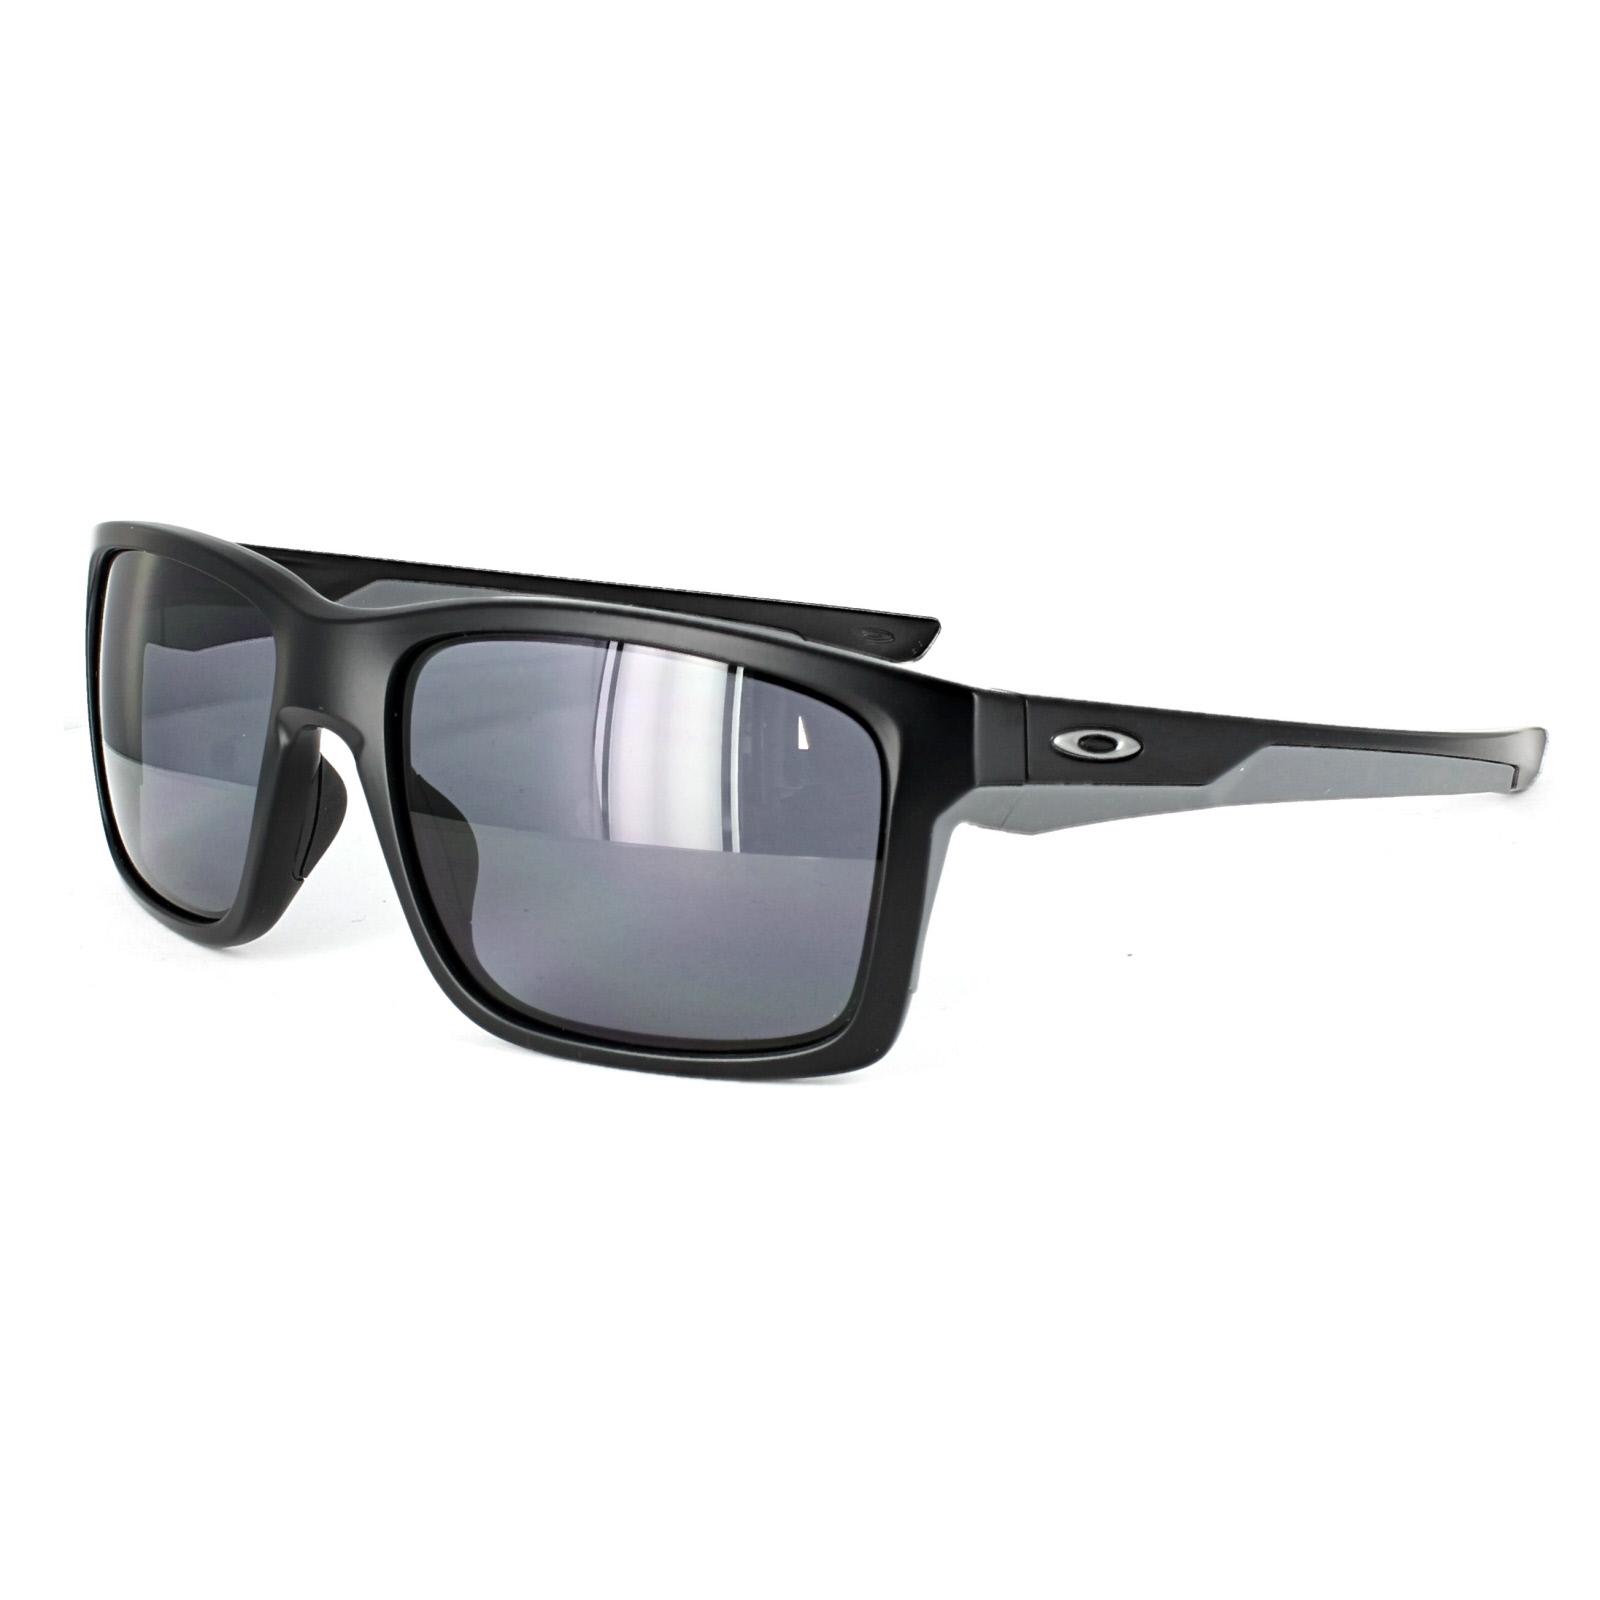 c7f0eec586e46 Sentinel Oakley Sunglasses Mainlink OO9264-01 Matt Black Grey